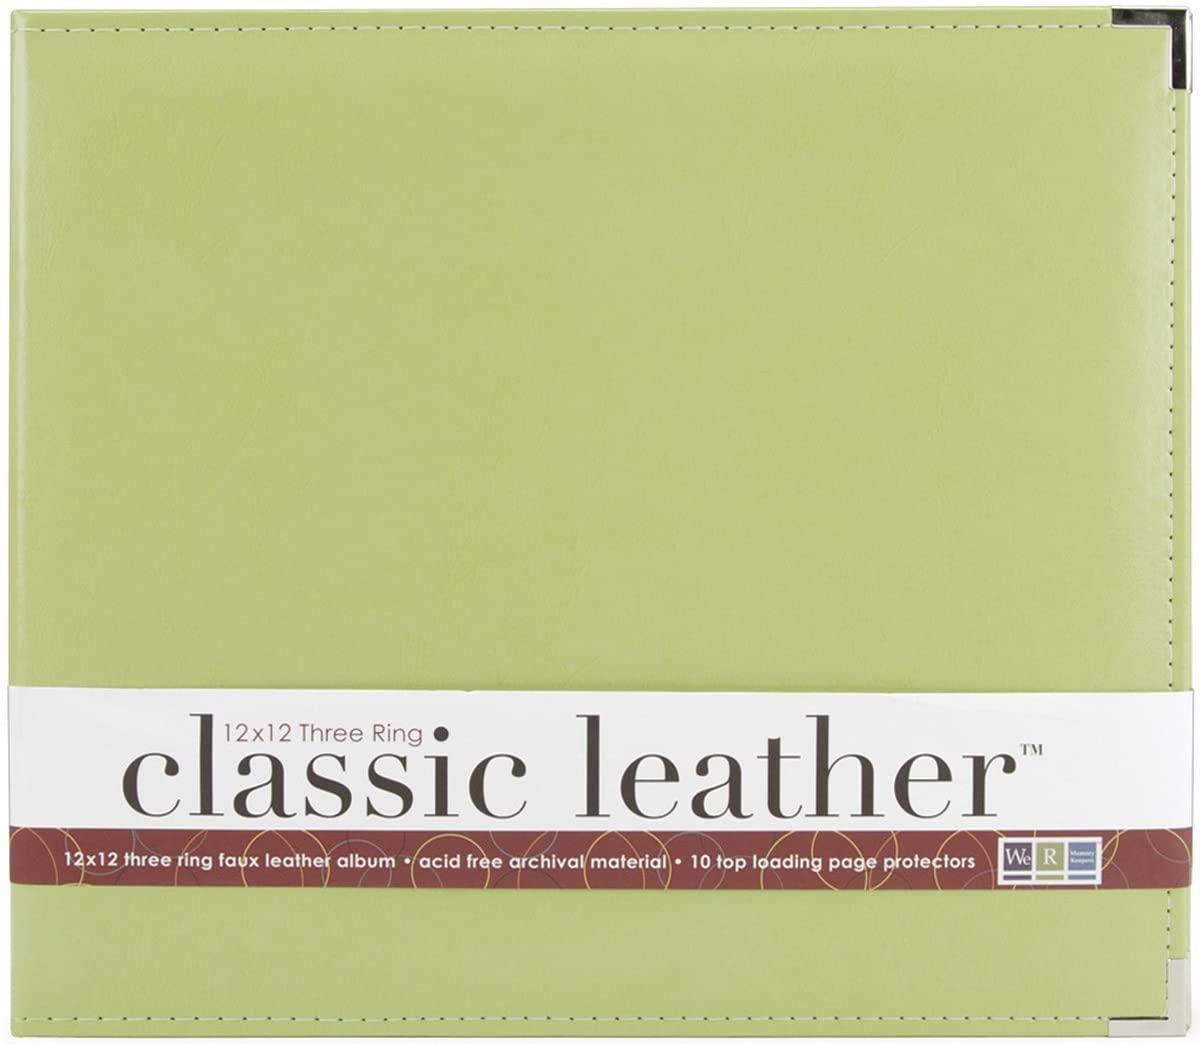 We R Memory Keepers 0633356609162 Classic Album Album & Sleeve-12 x 12-Ring-Kiwi